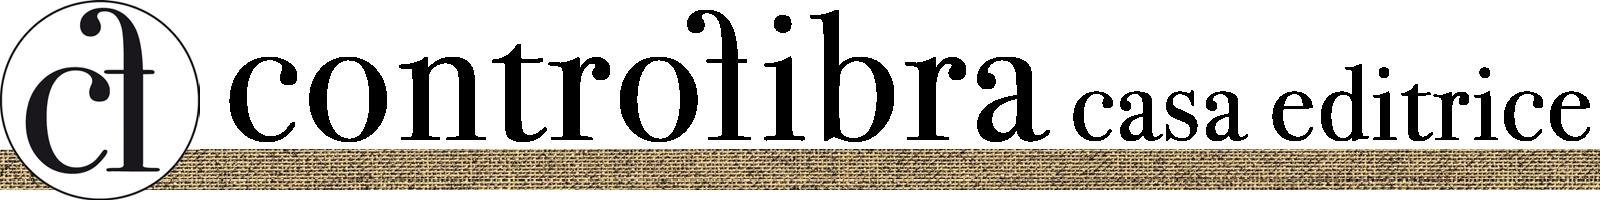 Controfibra casa editrice